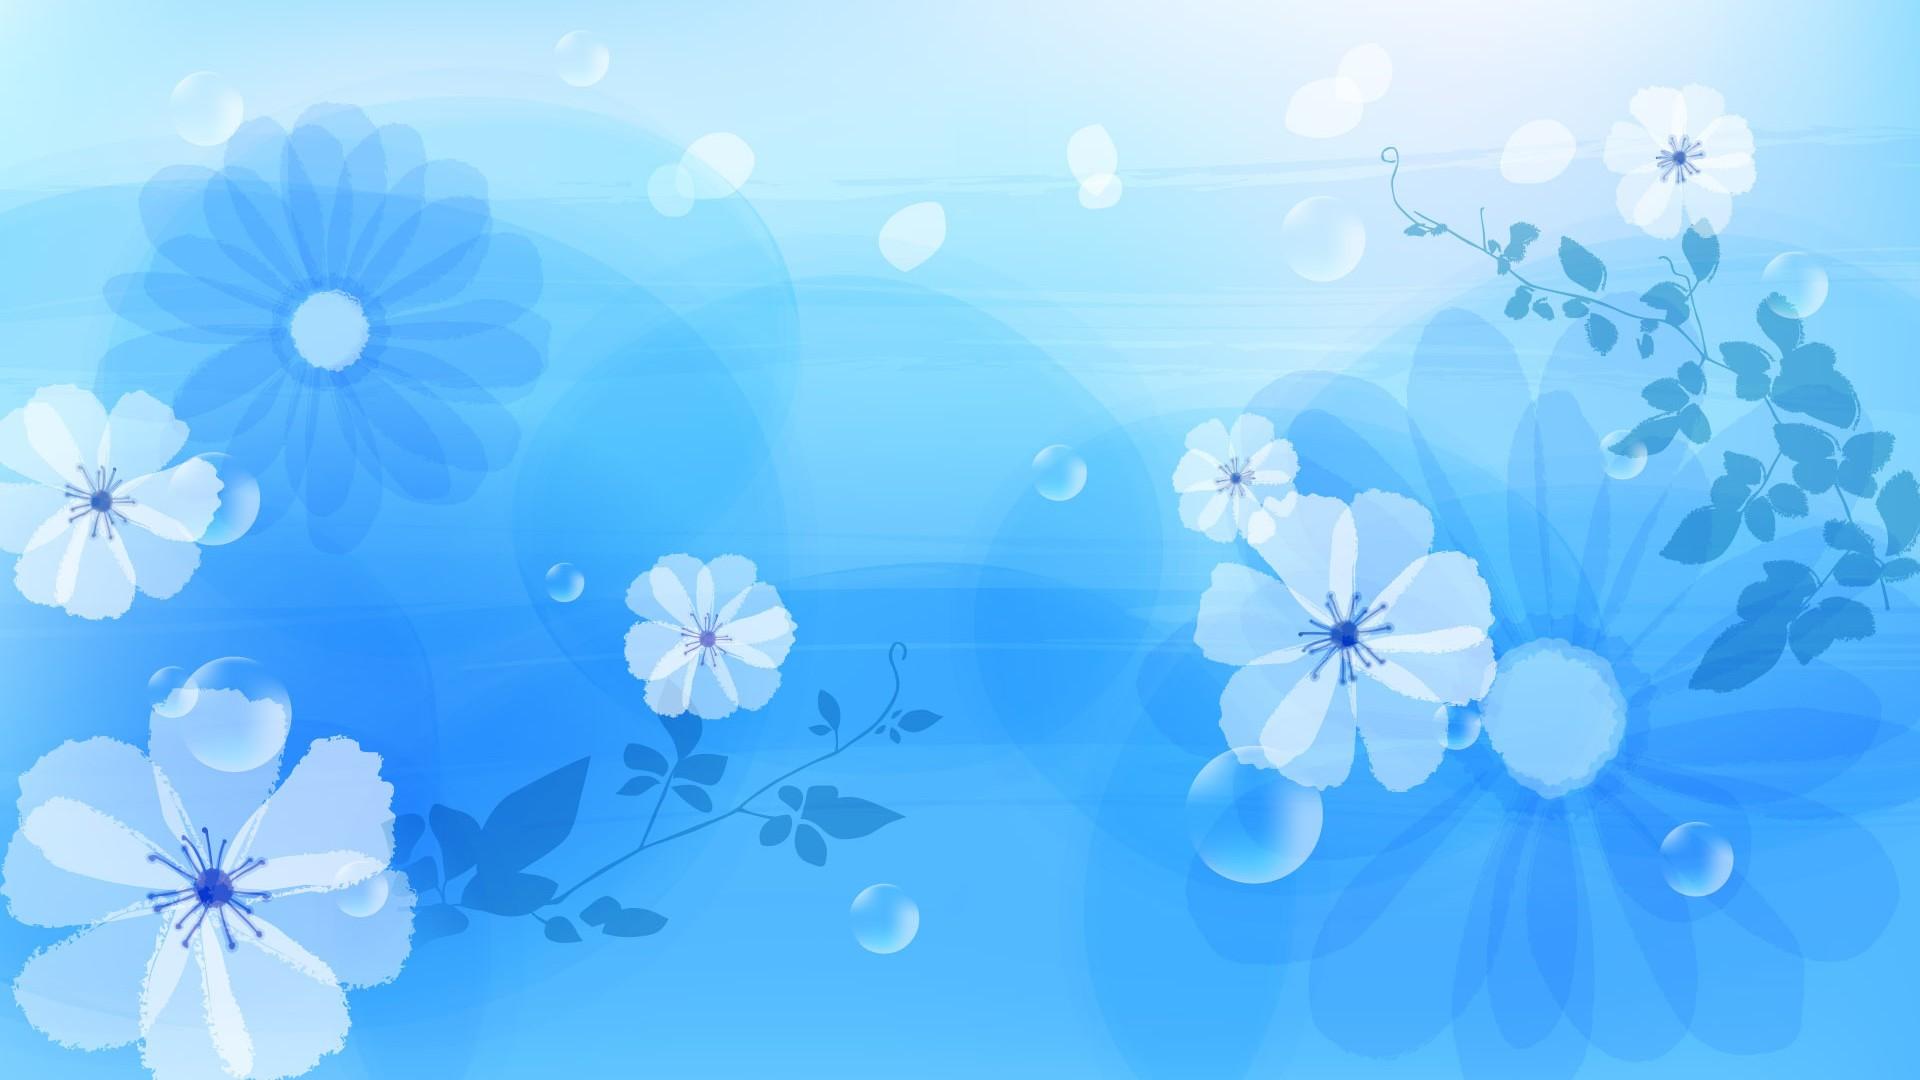 46+ Cute Light Blue Wallpaper on WallpaperSafari